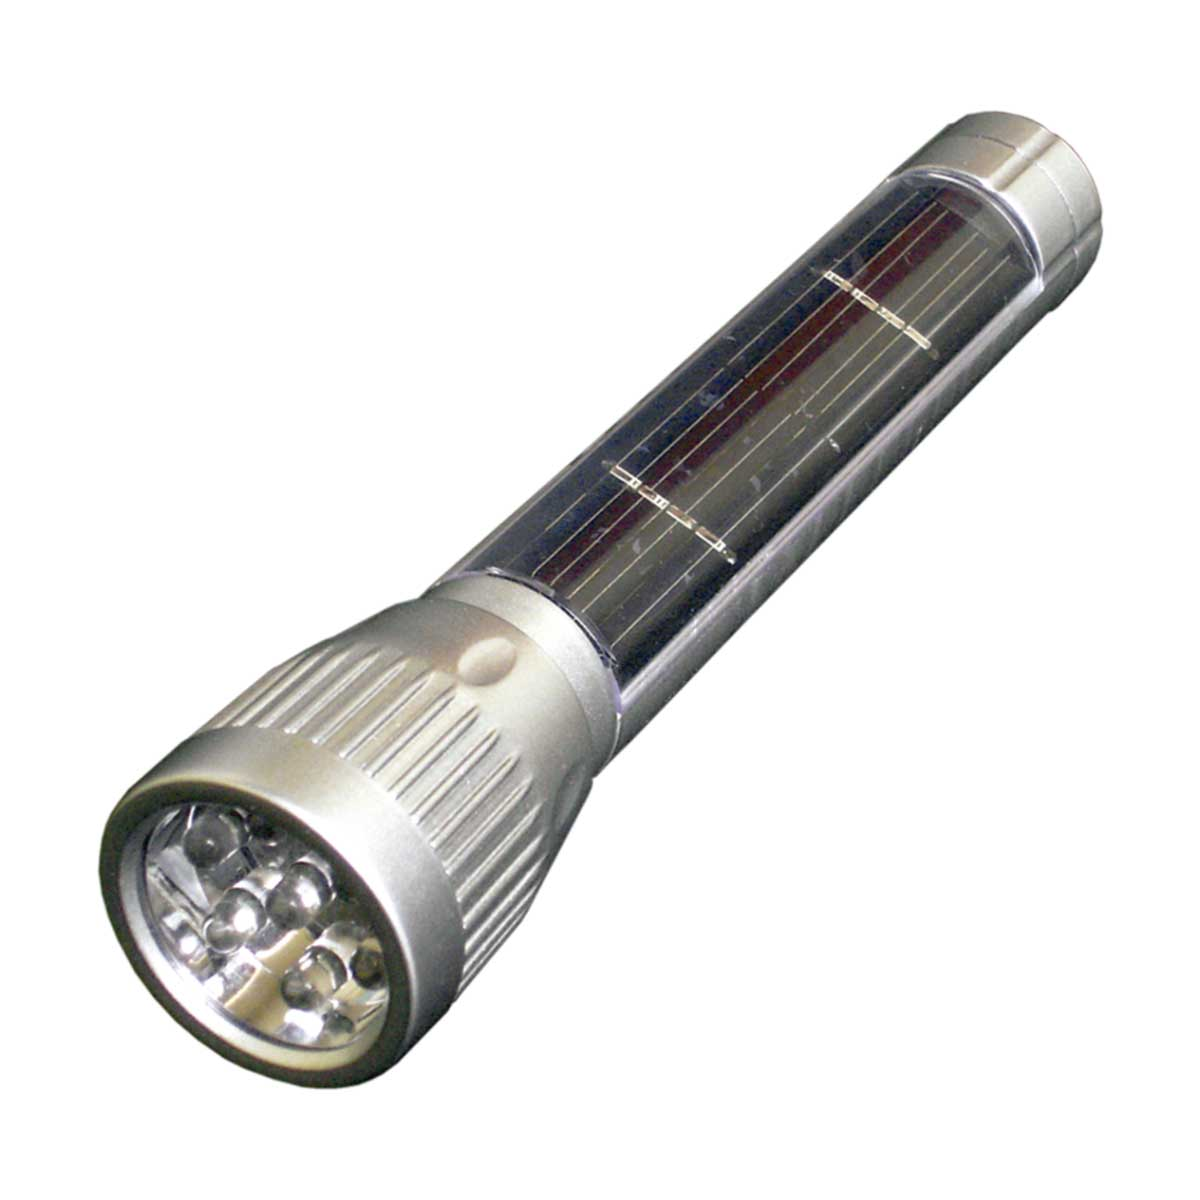 CSR8003 - Lanterna Alimentada por Energia Solar 7 LEDs CSR 8003 - CSR